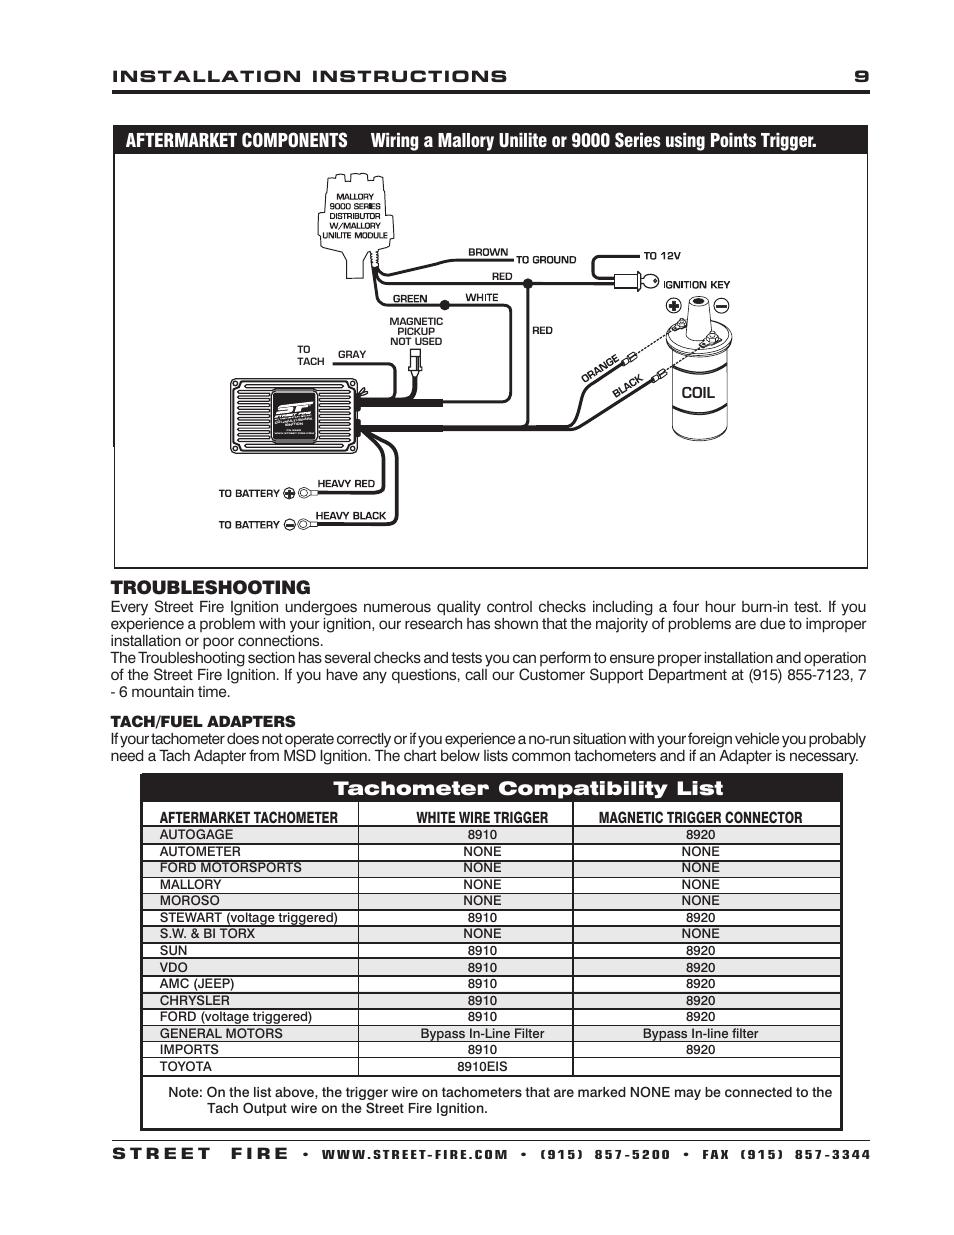 Msd Ignition Wiring Diagram 7al3 - Wiring Source •